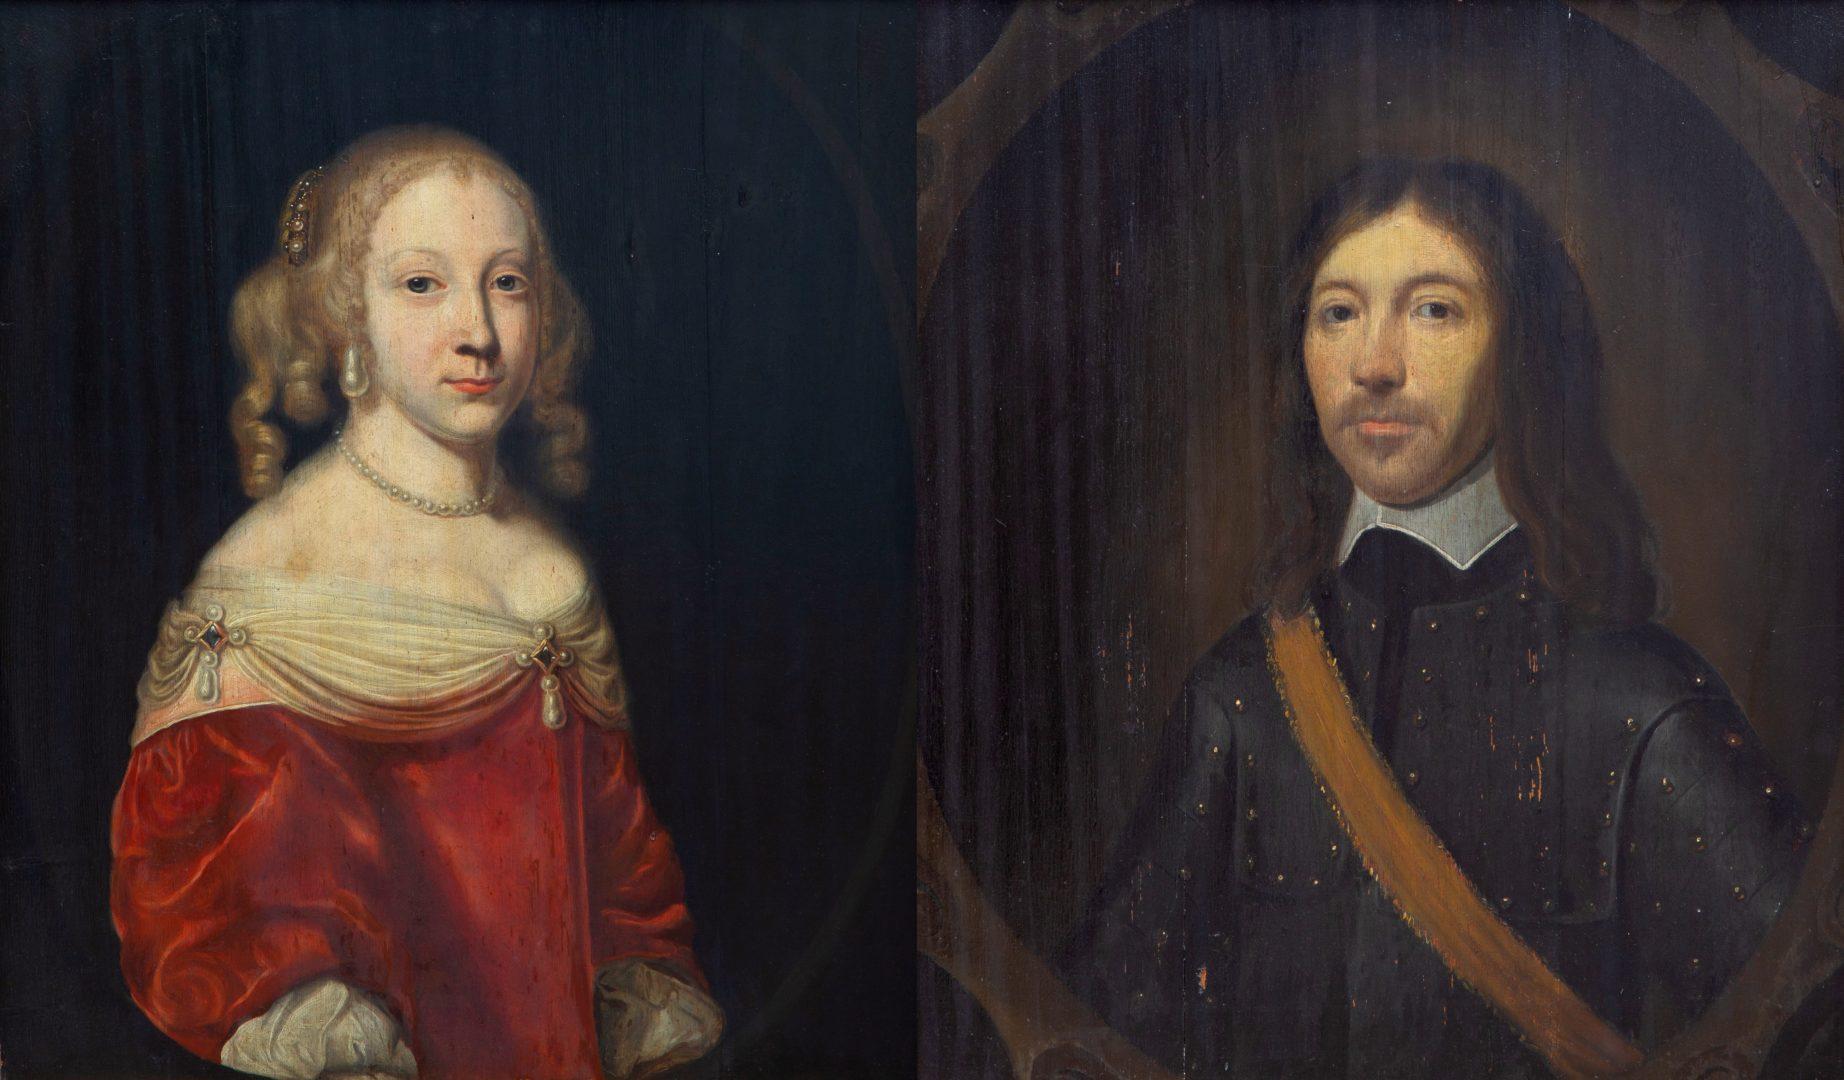 European Fine Art Veiling Venduehuis Den Haag De Portretten Van Vader En Dochter Ripperbant Adel In Nederland